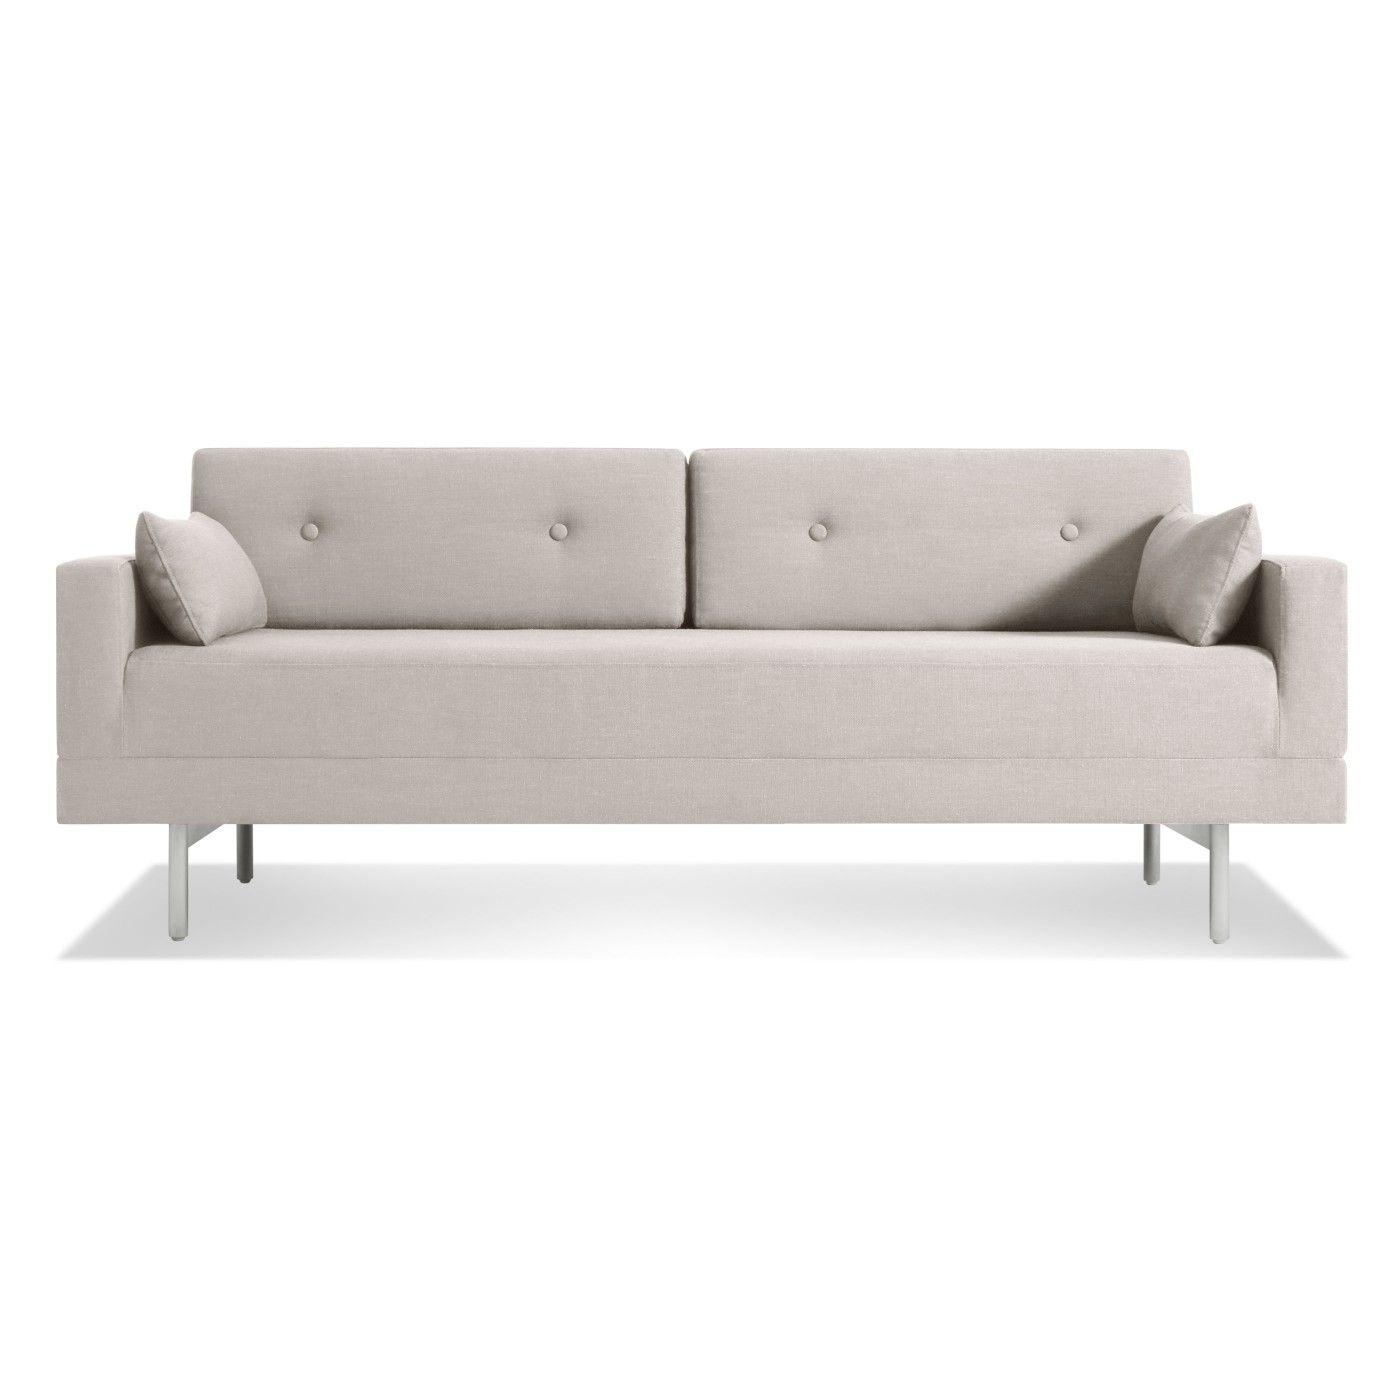 One Night Stand 80 Sleeper Sofa Modern Sleeper Sofa Sleeper Sofa Sofa